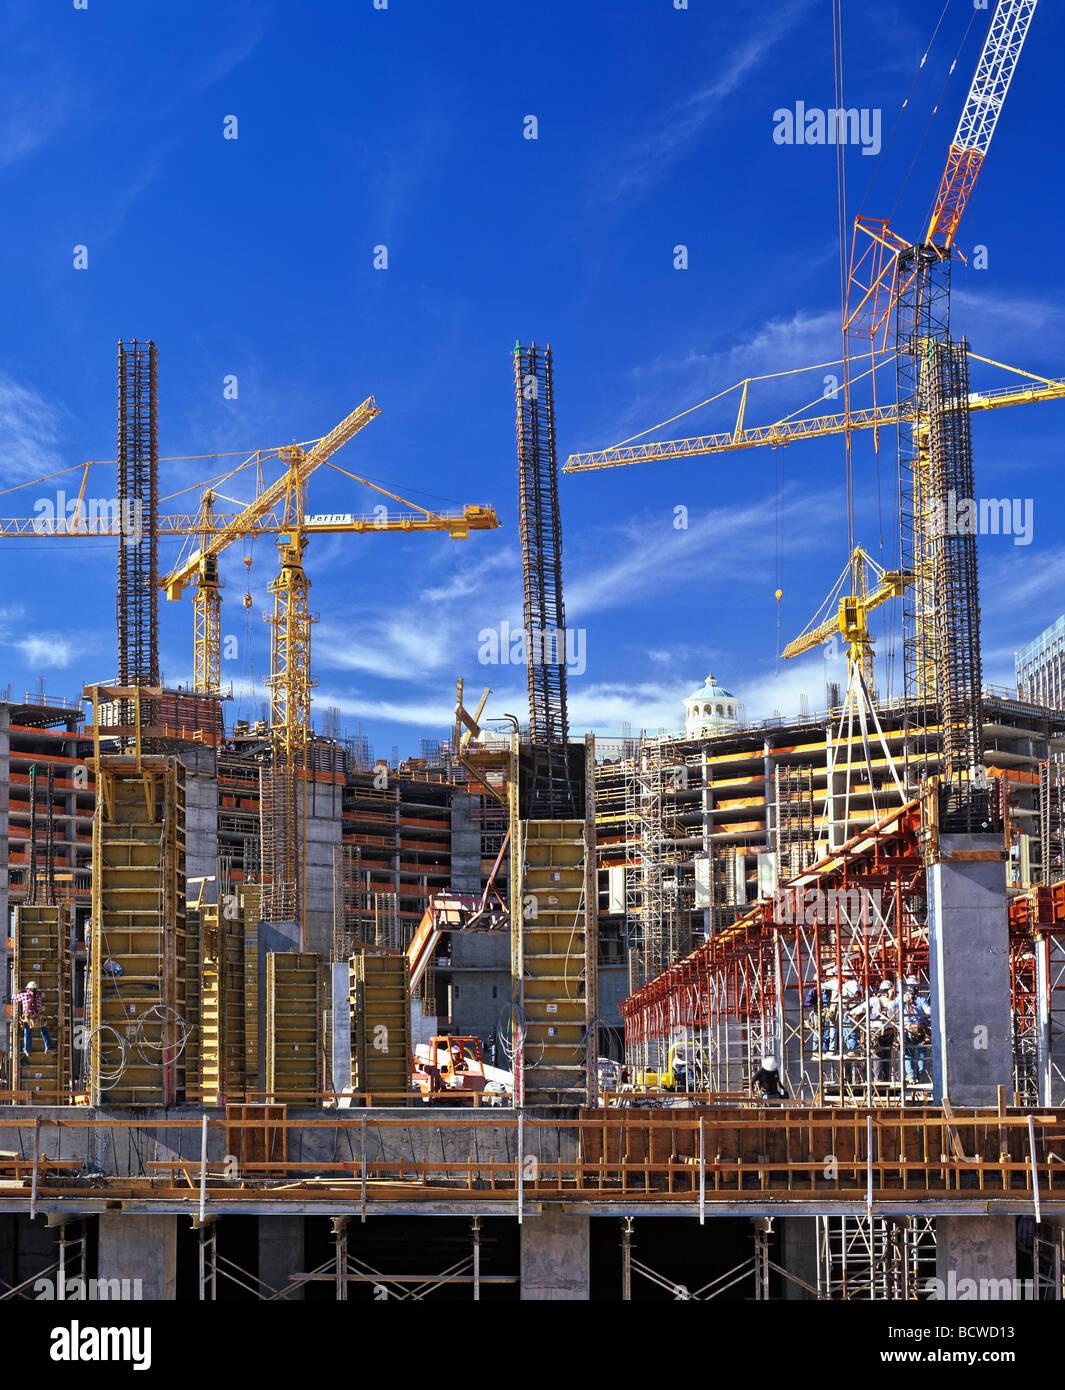 Krane, Großbaustelle, Hotelbau, Bauindustrie, USA Stockbild